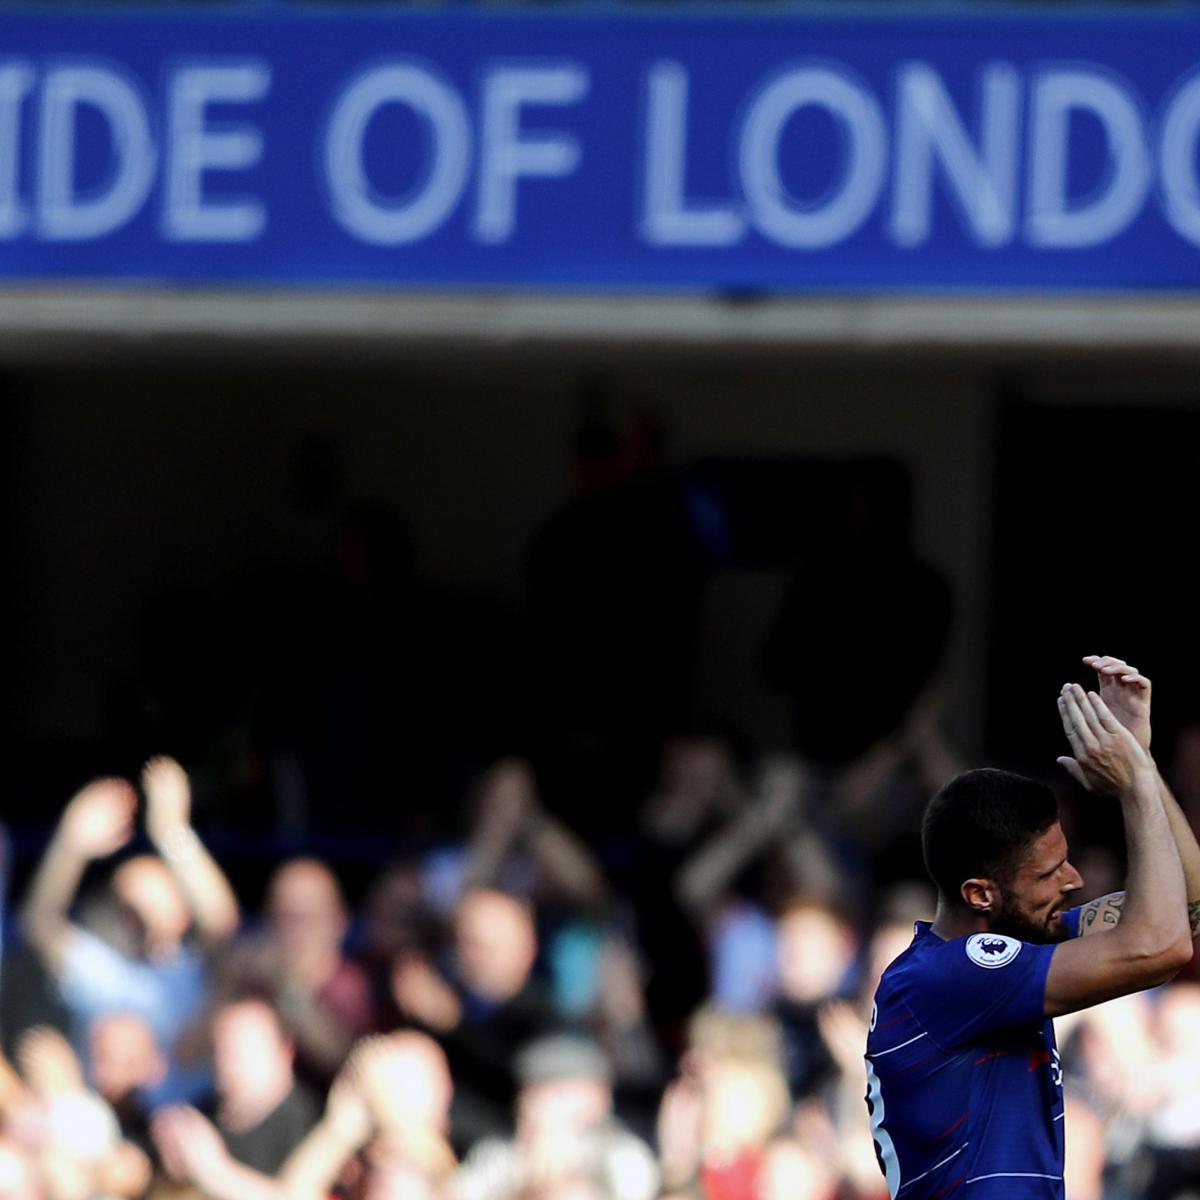 Chelsea vs. Cardiff City: Odds, Preview, Live Stream, TV Info